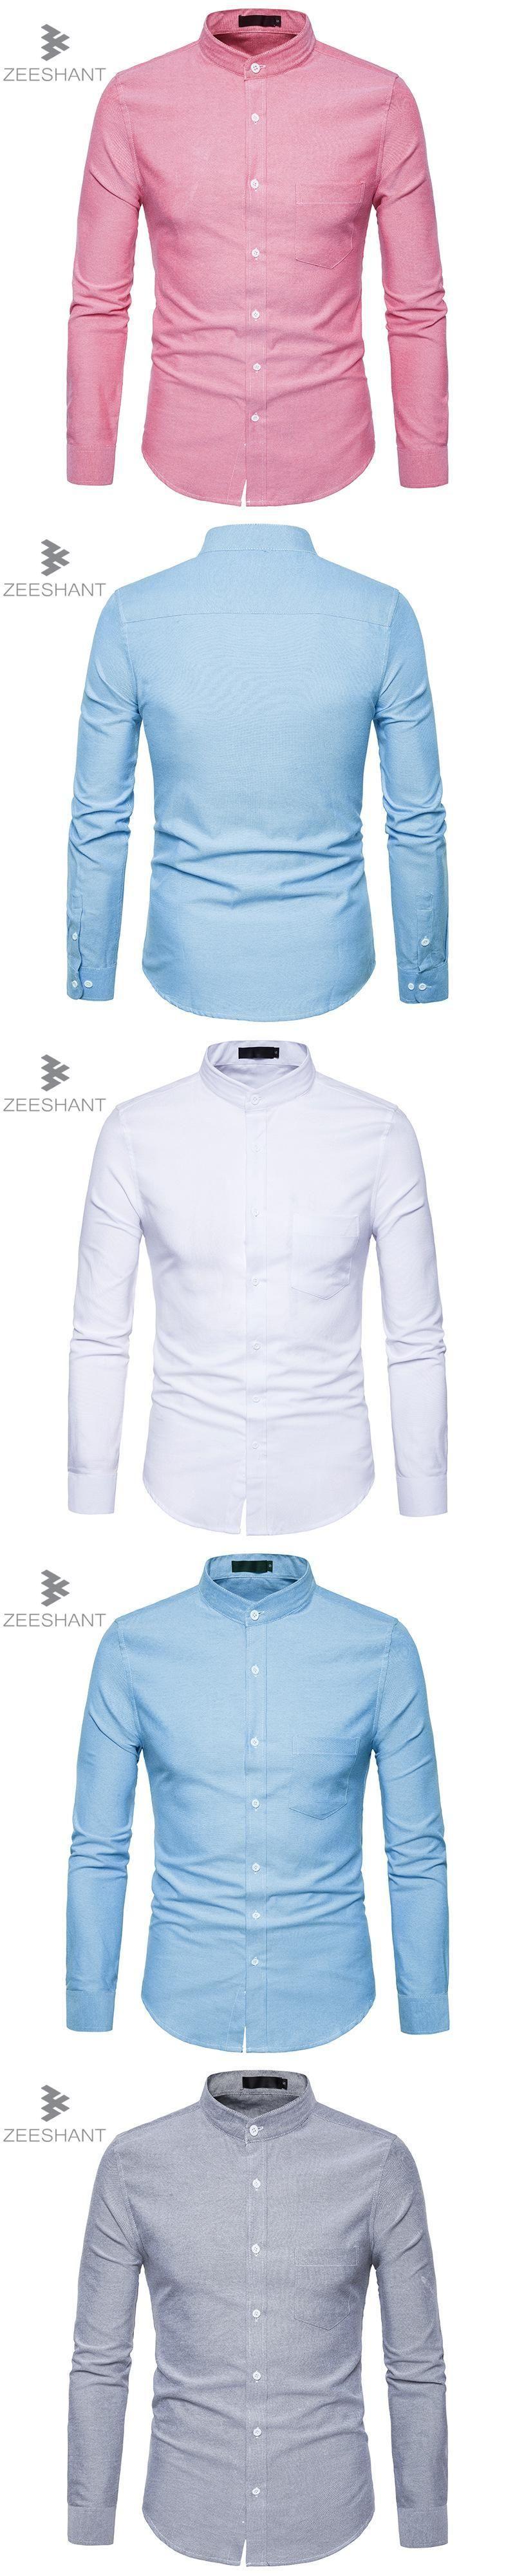 Zeeshant Solid Color Men Shirt Tuxedo Shirts Bridegroom Wedding ...